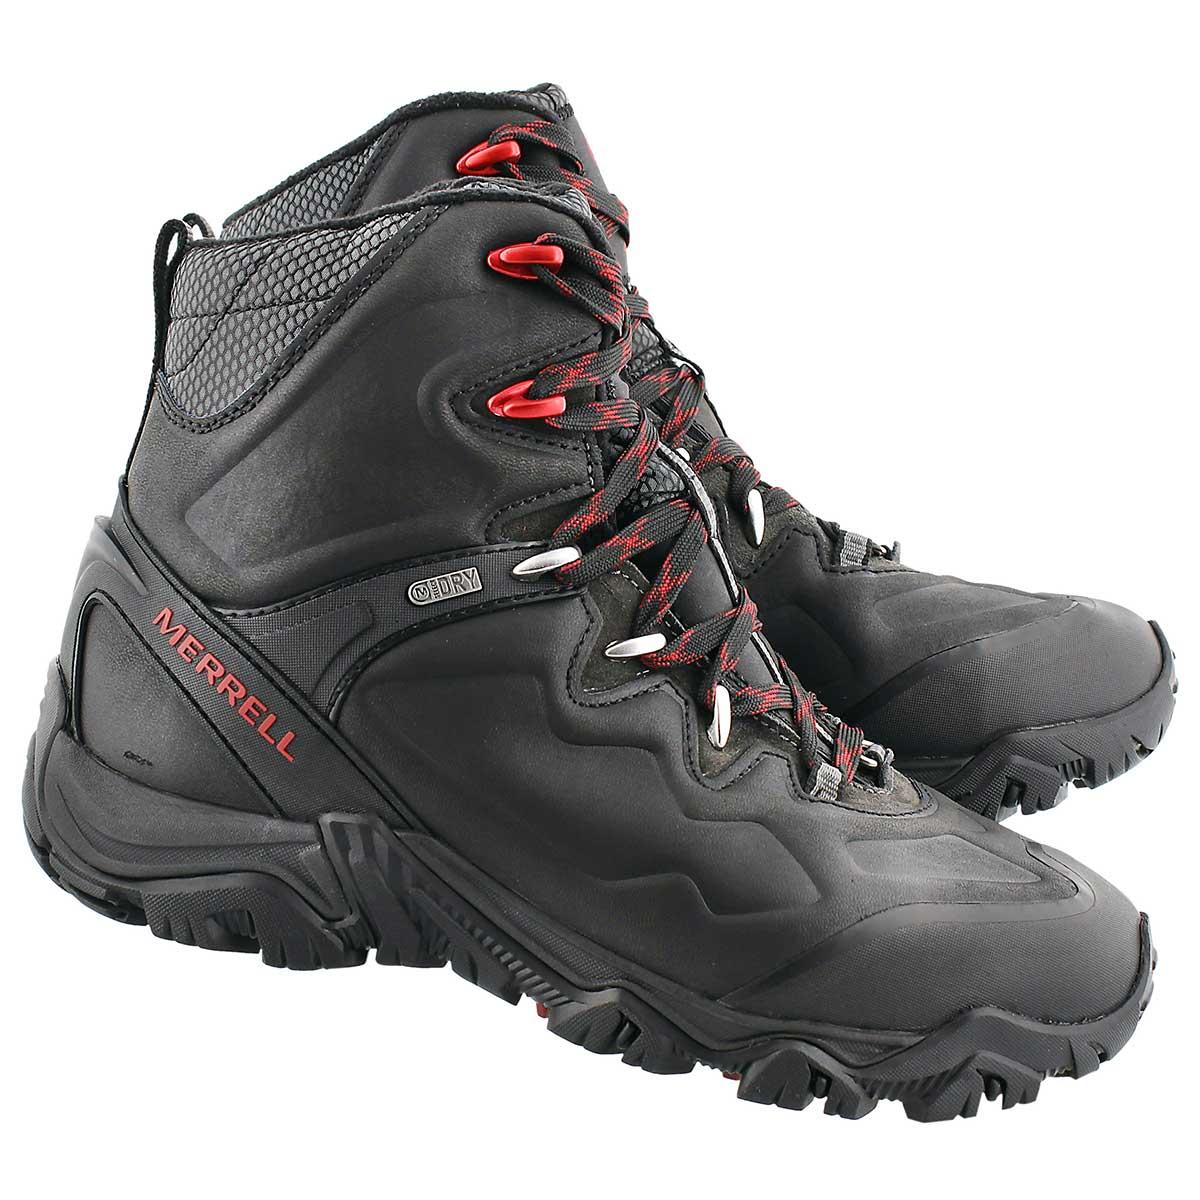 Mns Polarand 8 black wtrpf winter boot